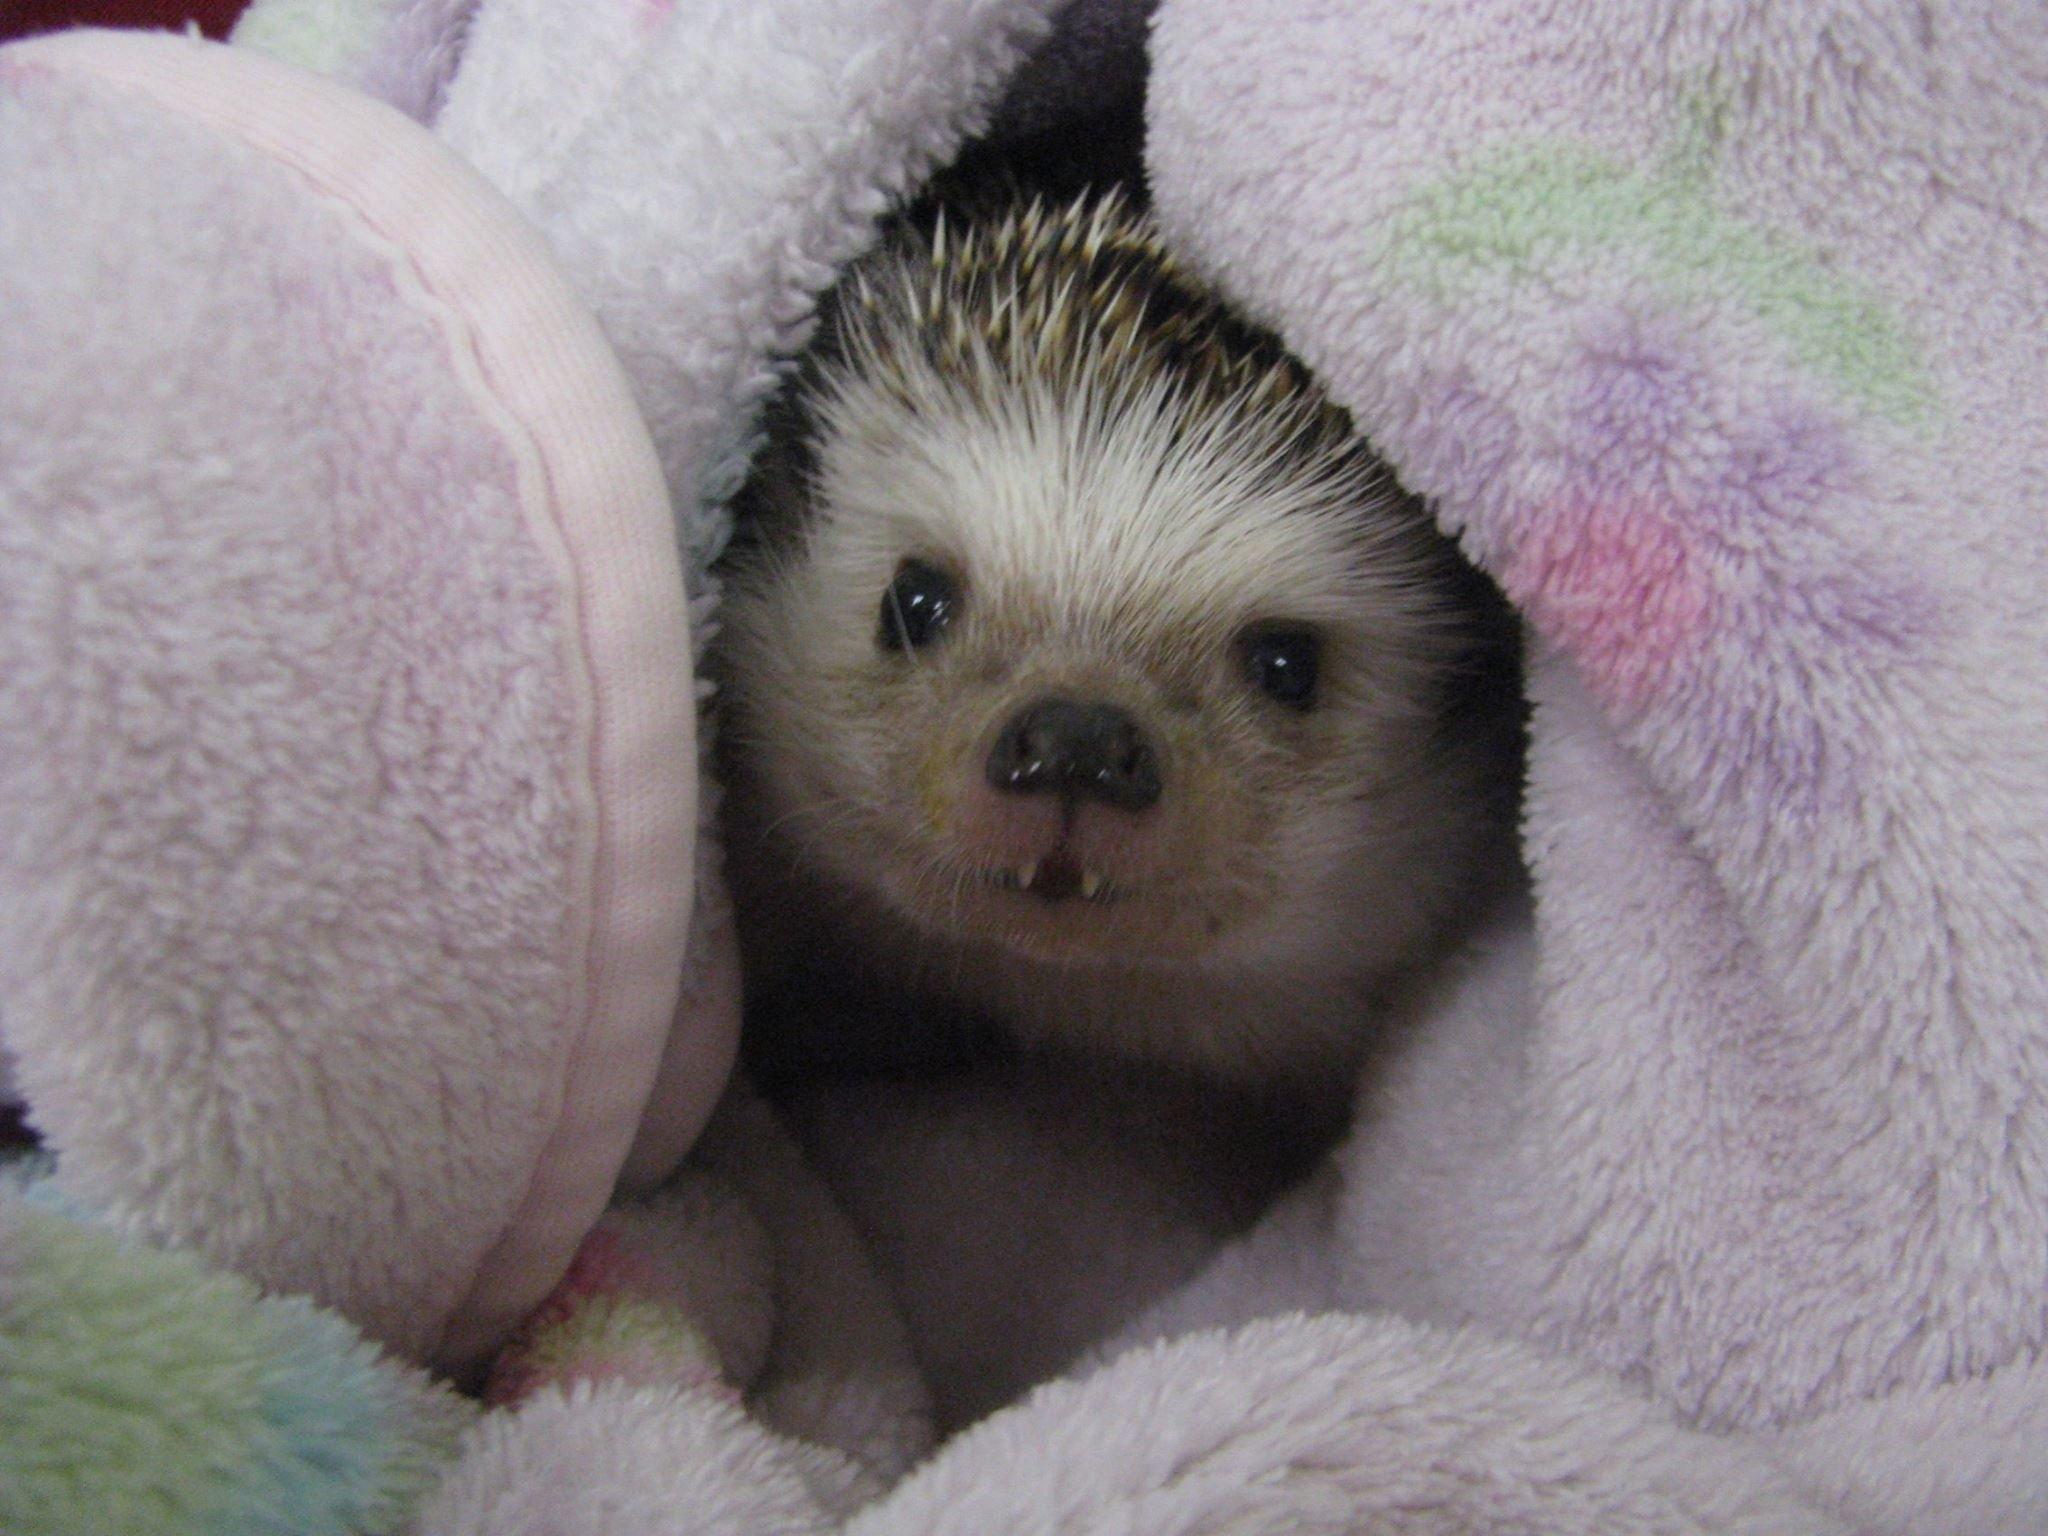 Hedgehog cuddle